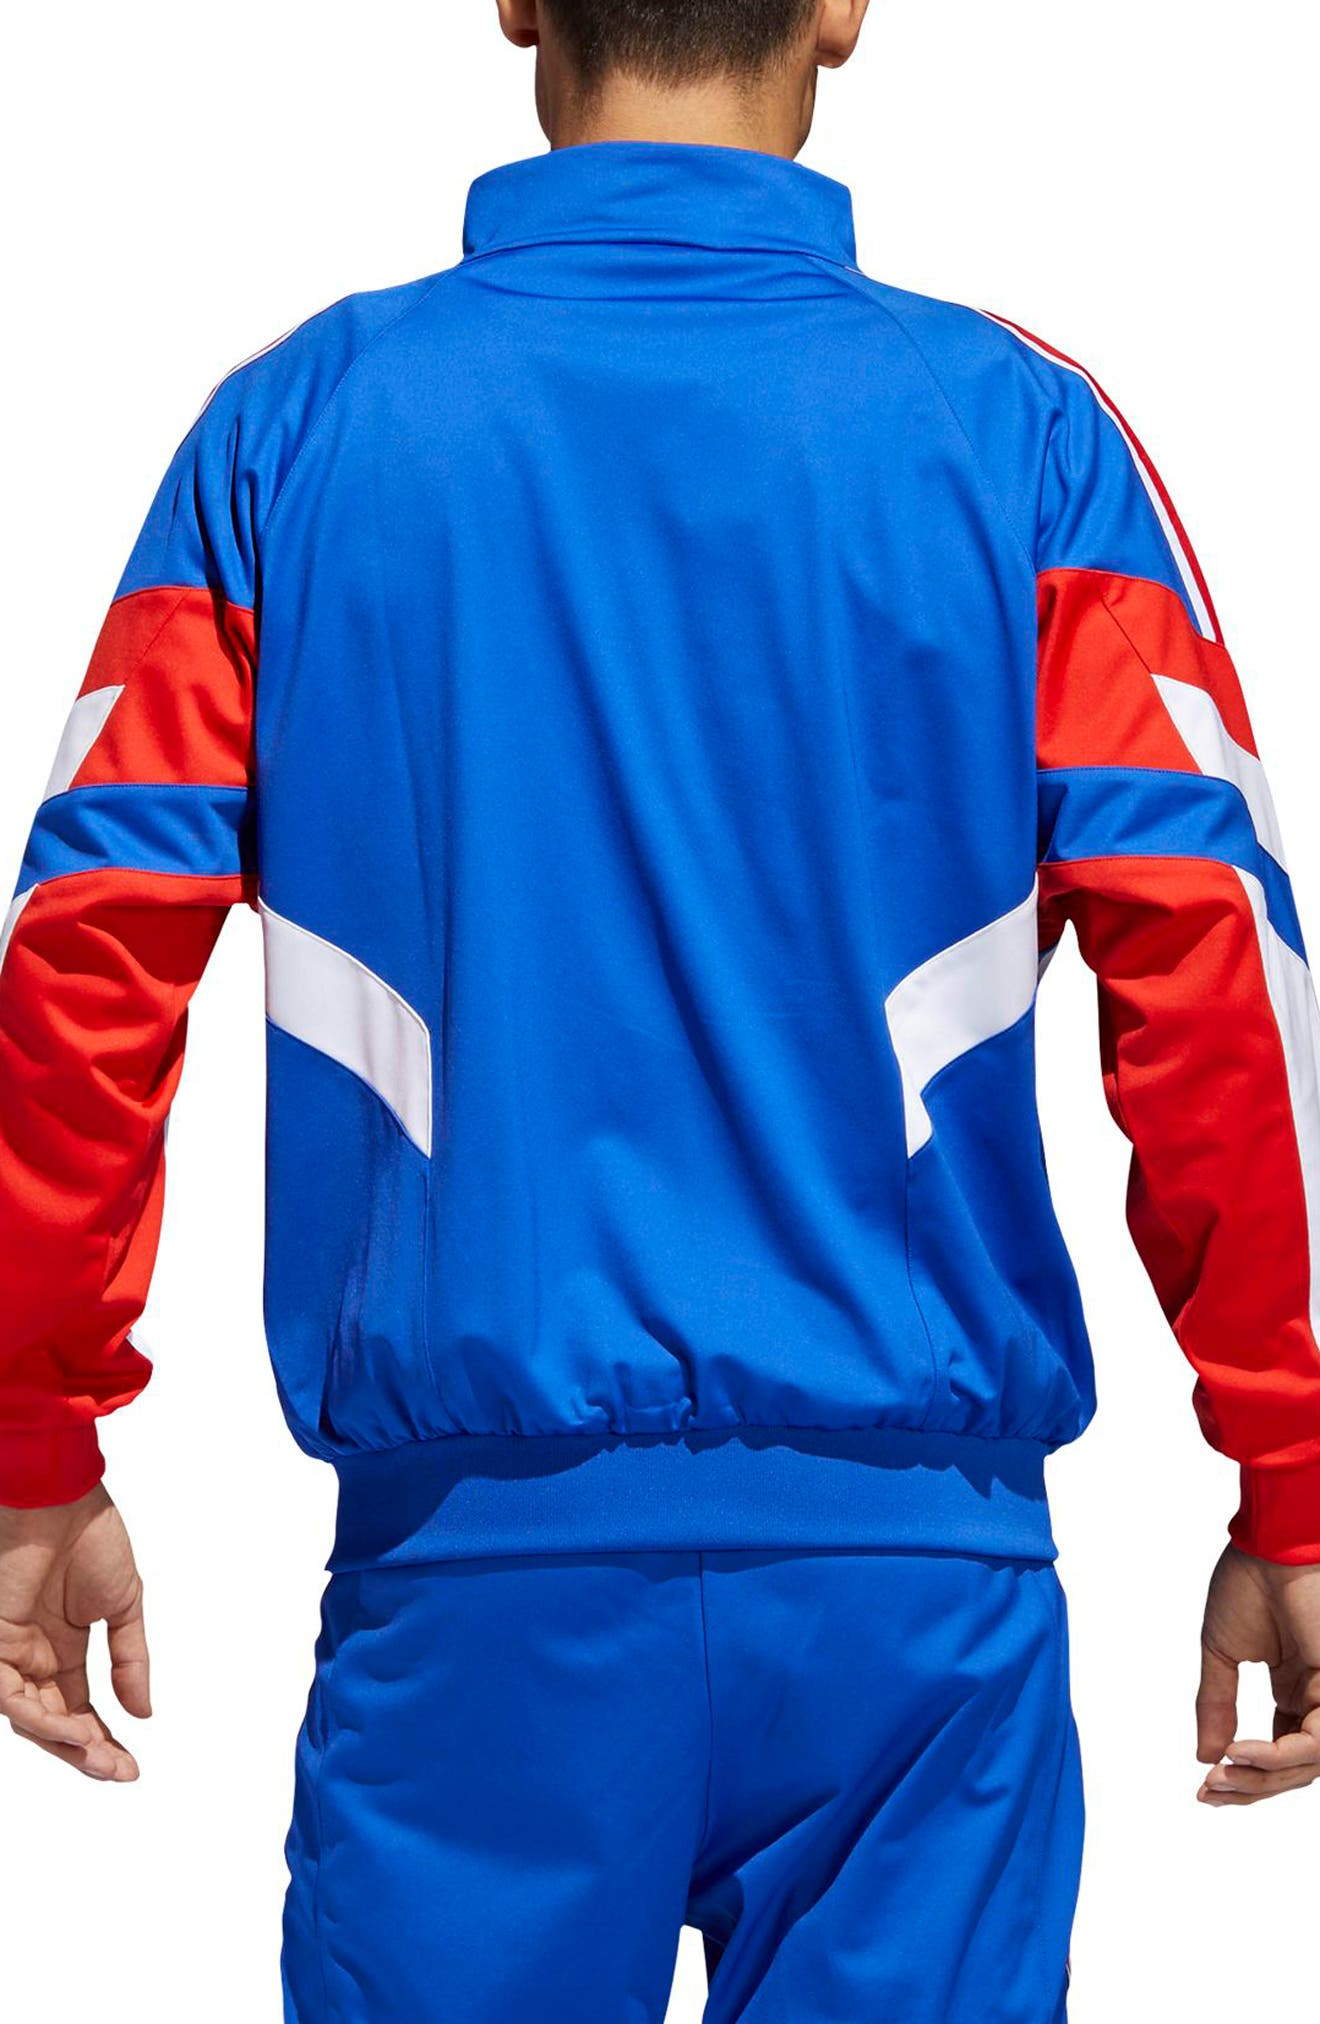 Aloxe Track Jacket,                             Alternate thumbnail 2, color,                             BOLD BLUE/ WHITE